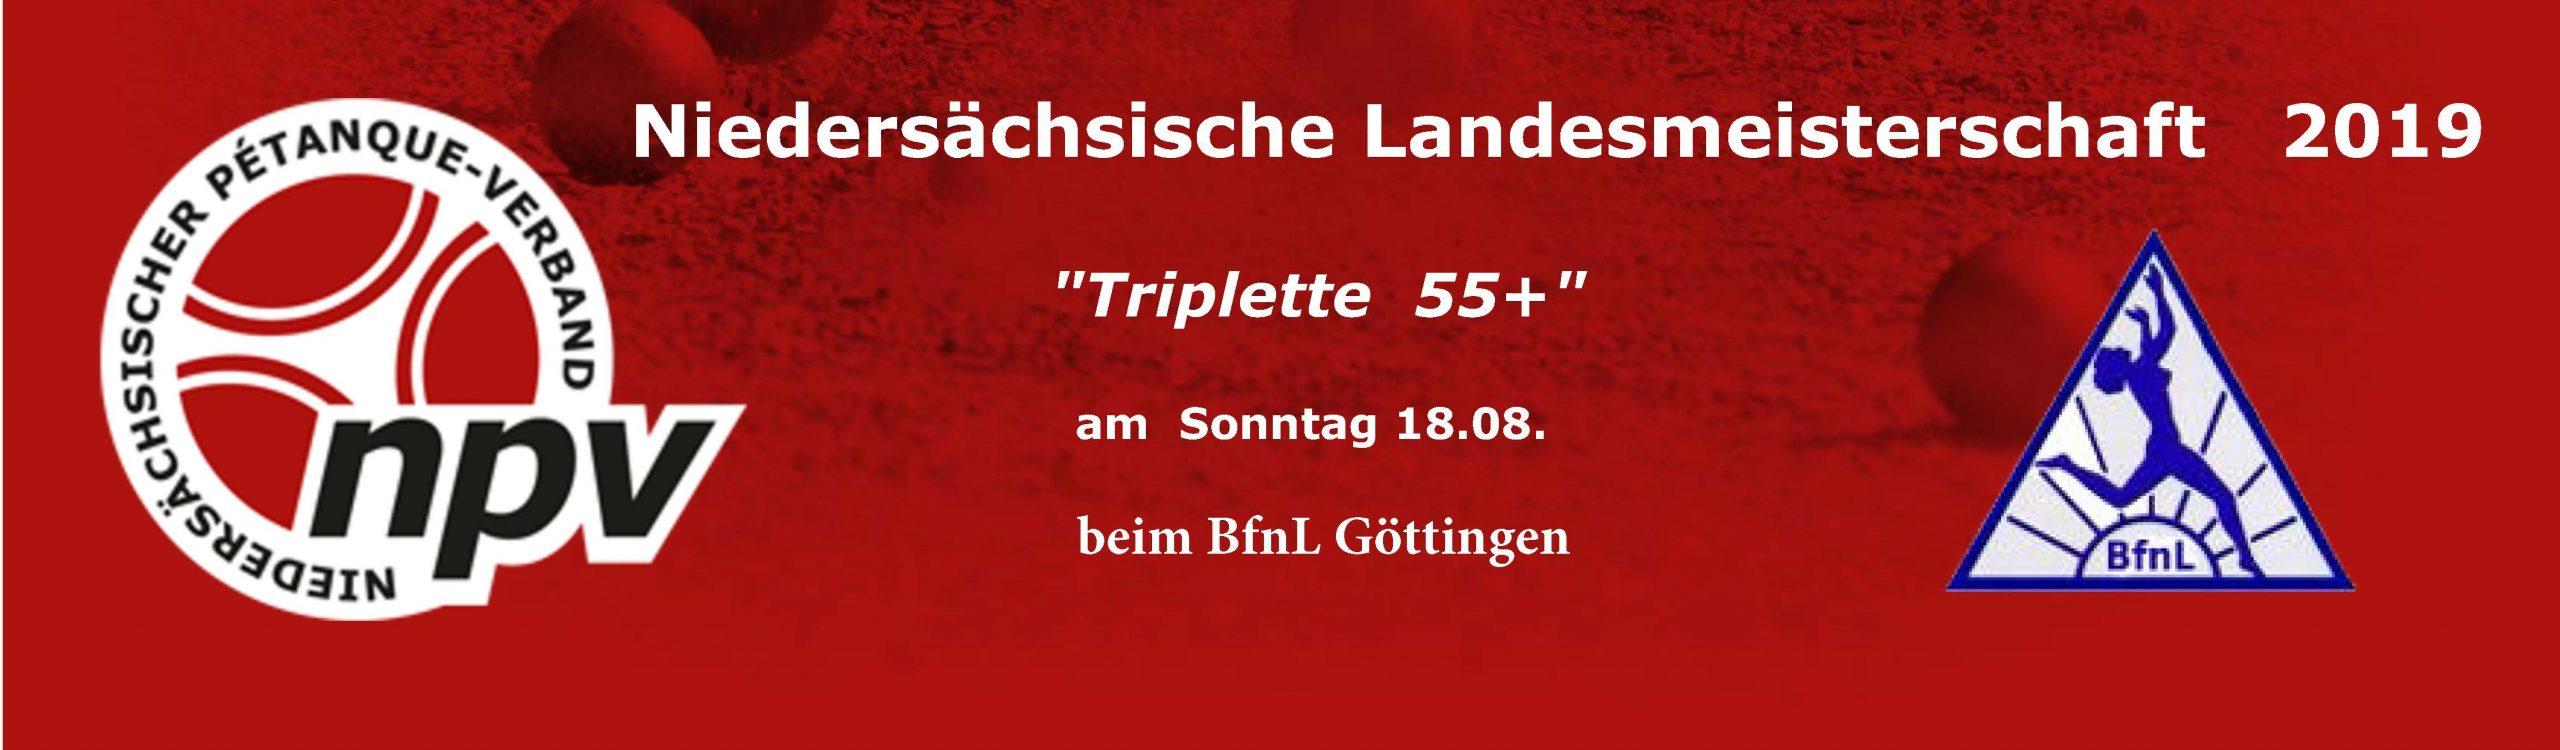 LM Triplette 55+